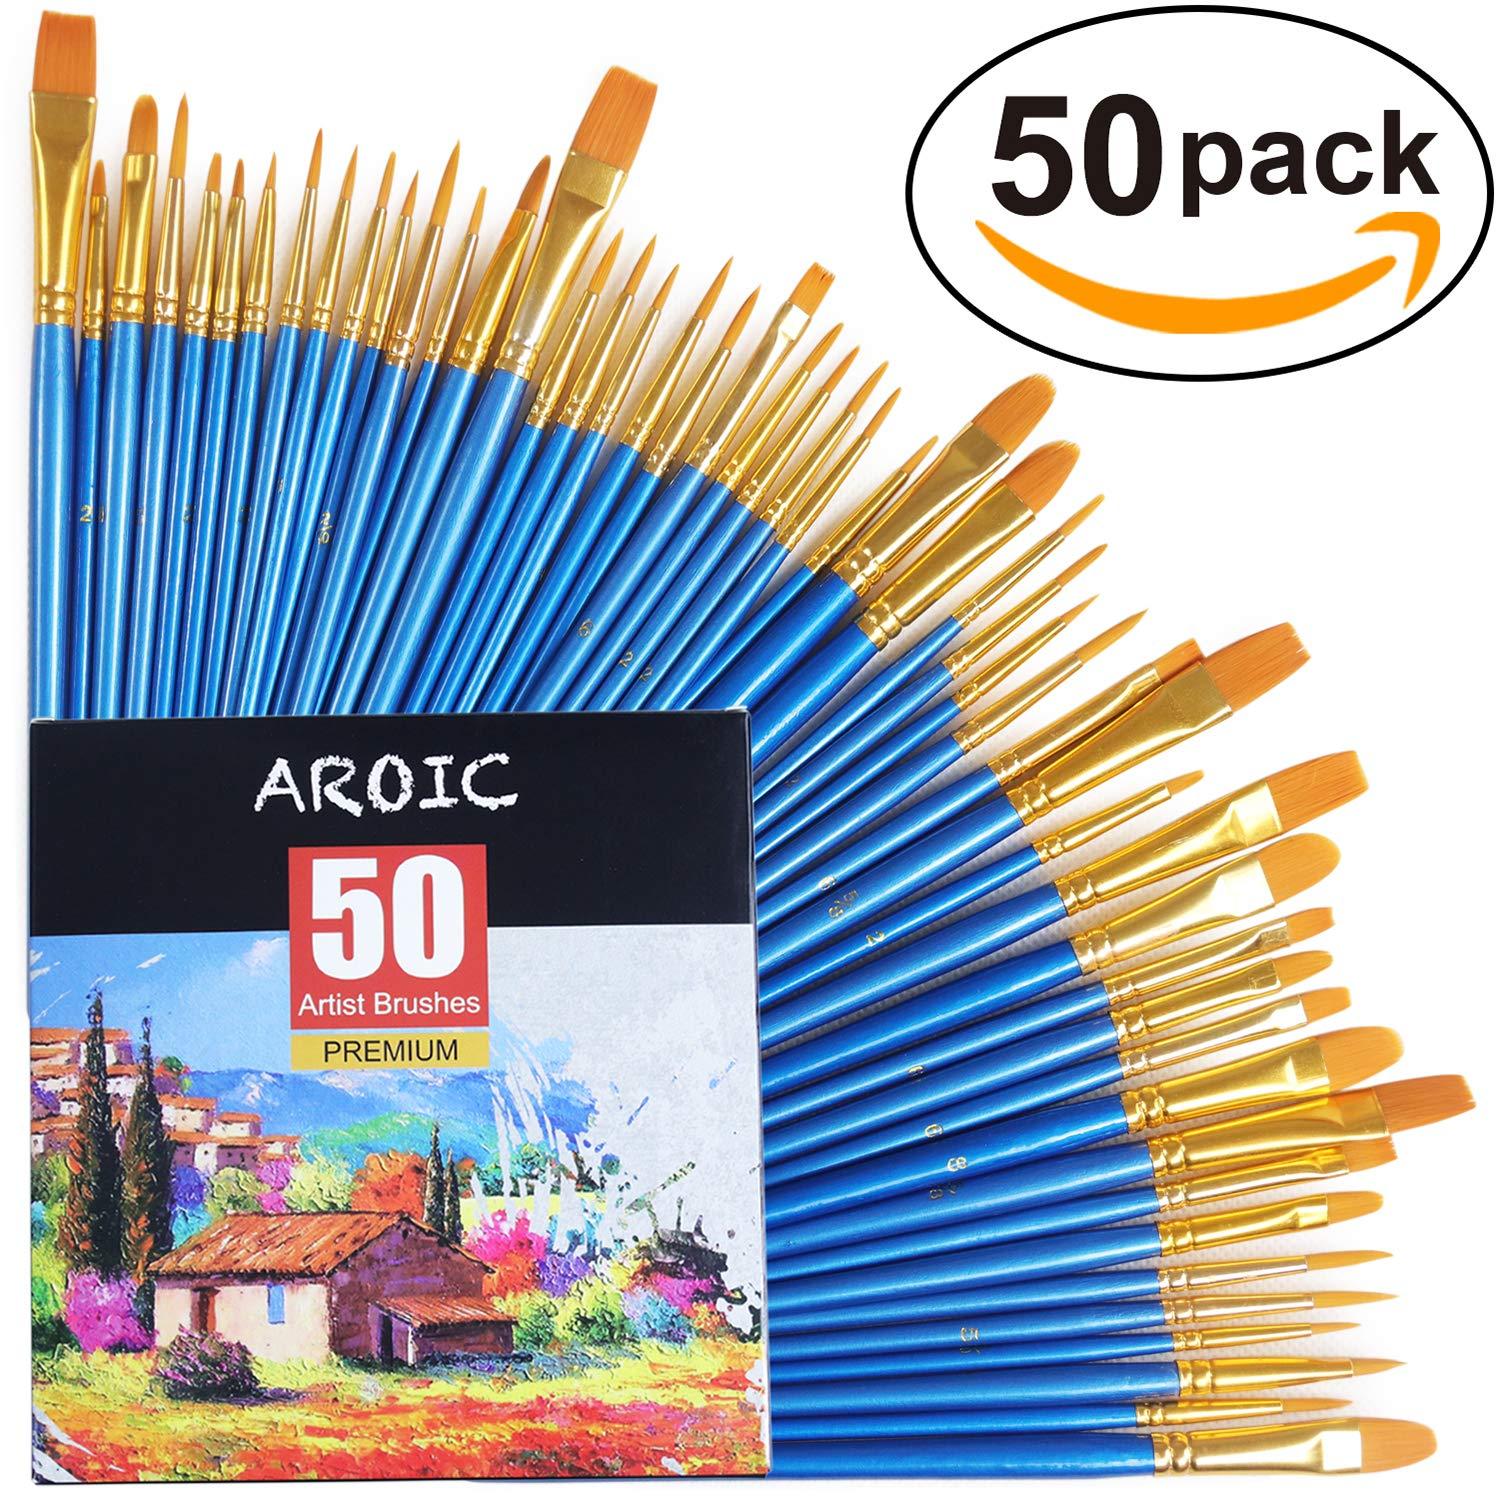 Paint Brush Set, 50 pcs Nylon Hair Brushes for Acrylic Oil Watercolor Painting Artist Professional Painting Kits